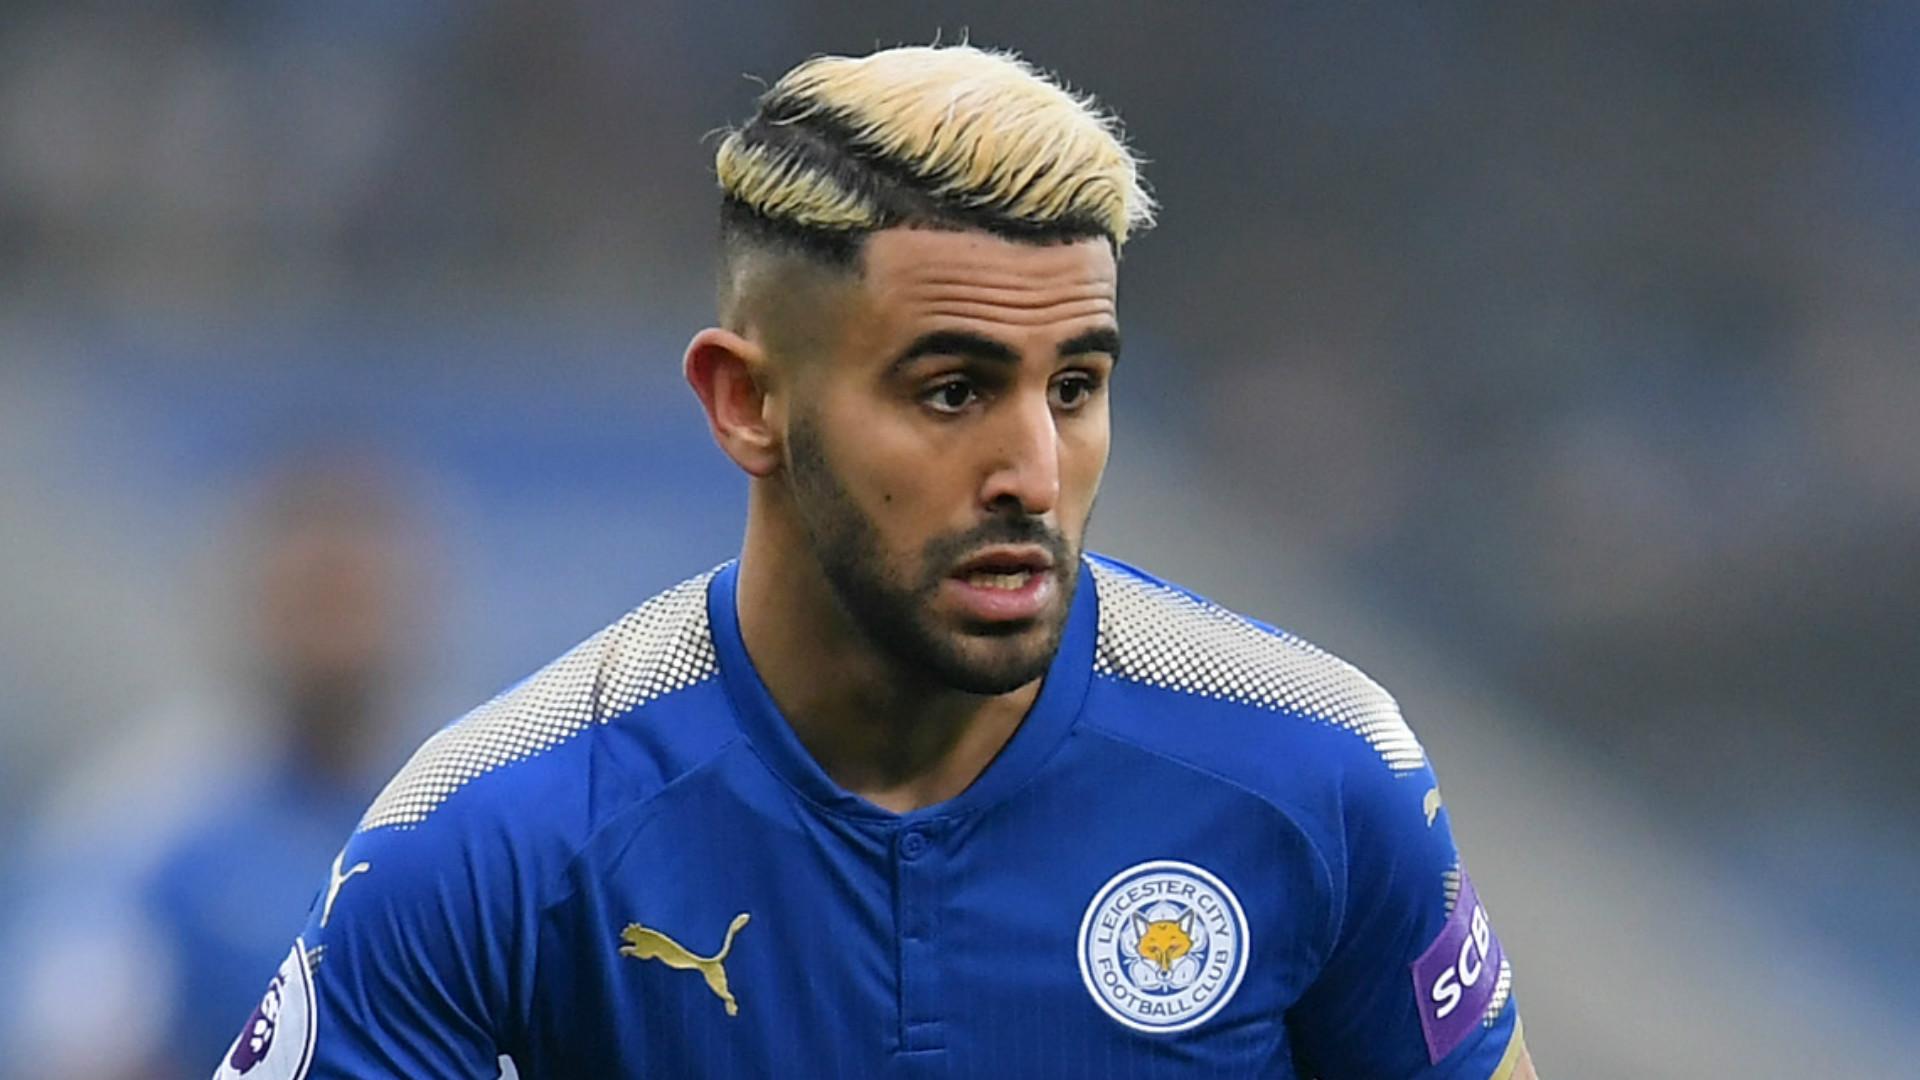 Video Riyad Mahrez Player Profile Soccer Sporting News